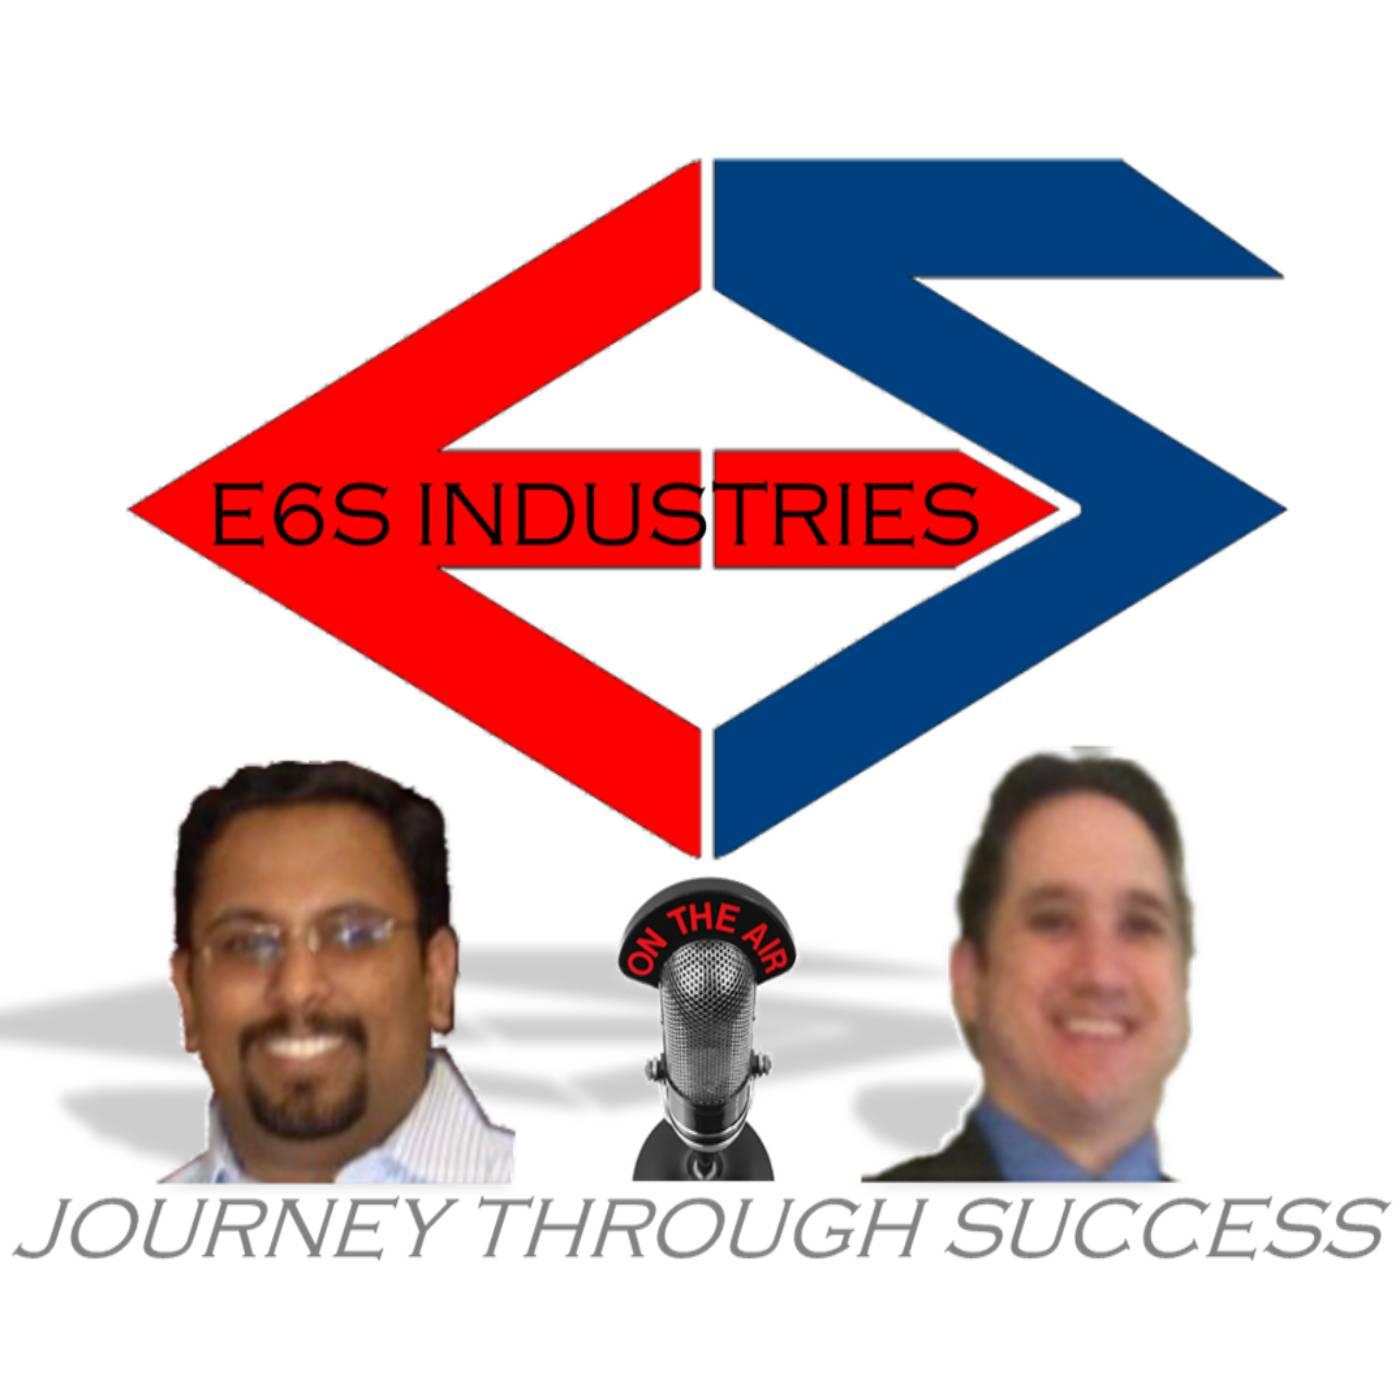 E6S-Methods Lean Six Sigma Performance Podcast with Aaron Spearin & Jacob Kurian